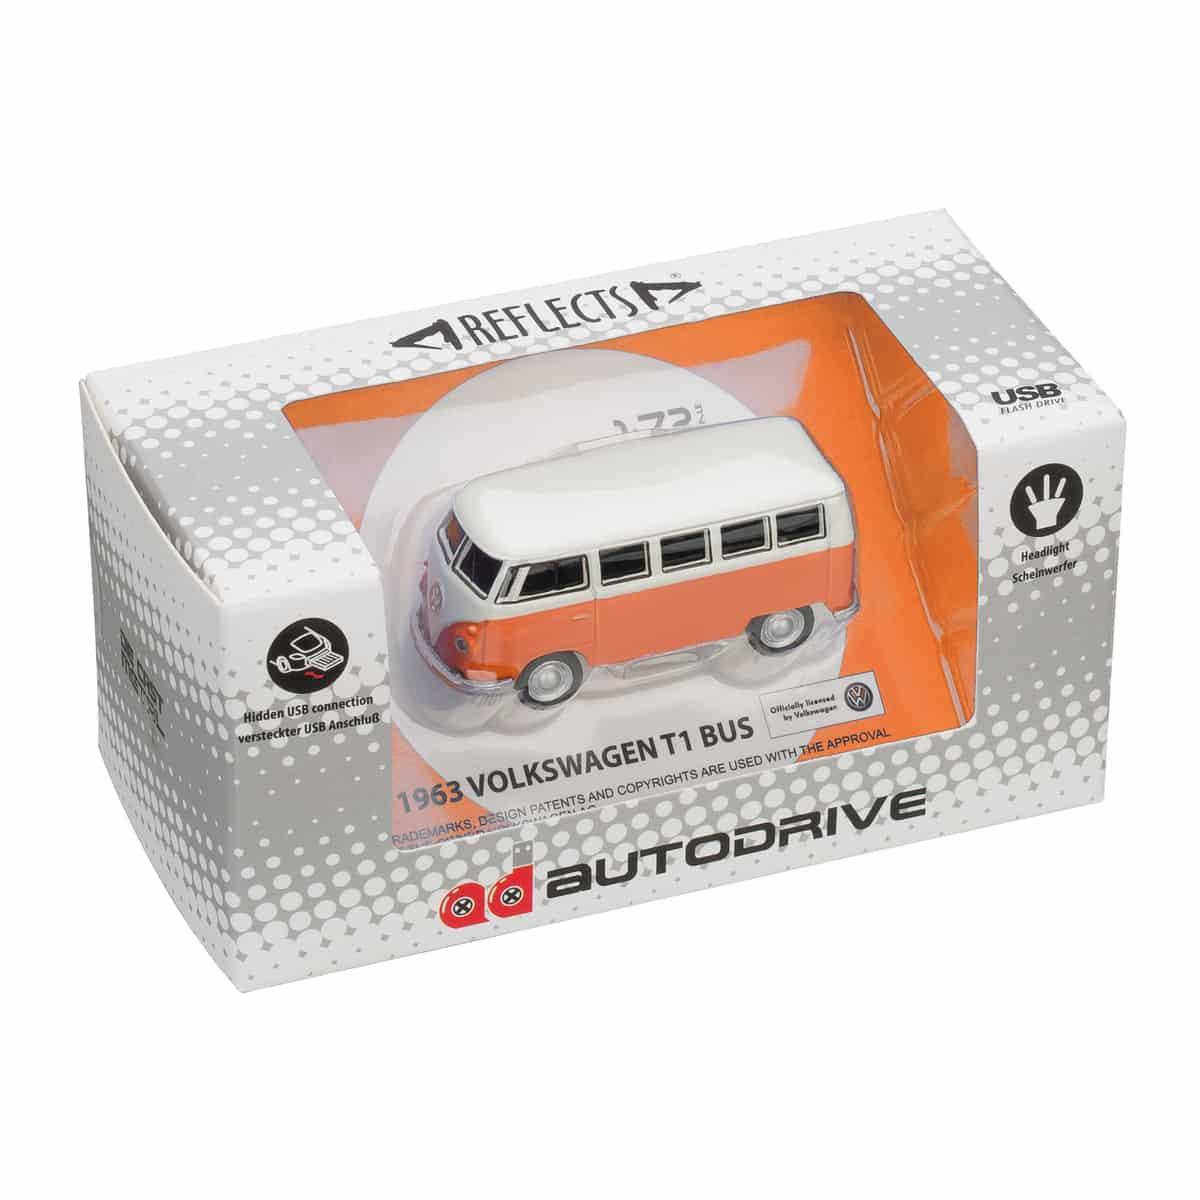 usb stick flash drive volkswagen t1 bus usb wereld. Black Bedroom Furniture Sets. Home Design Ideas